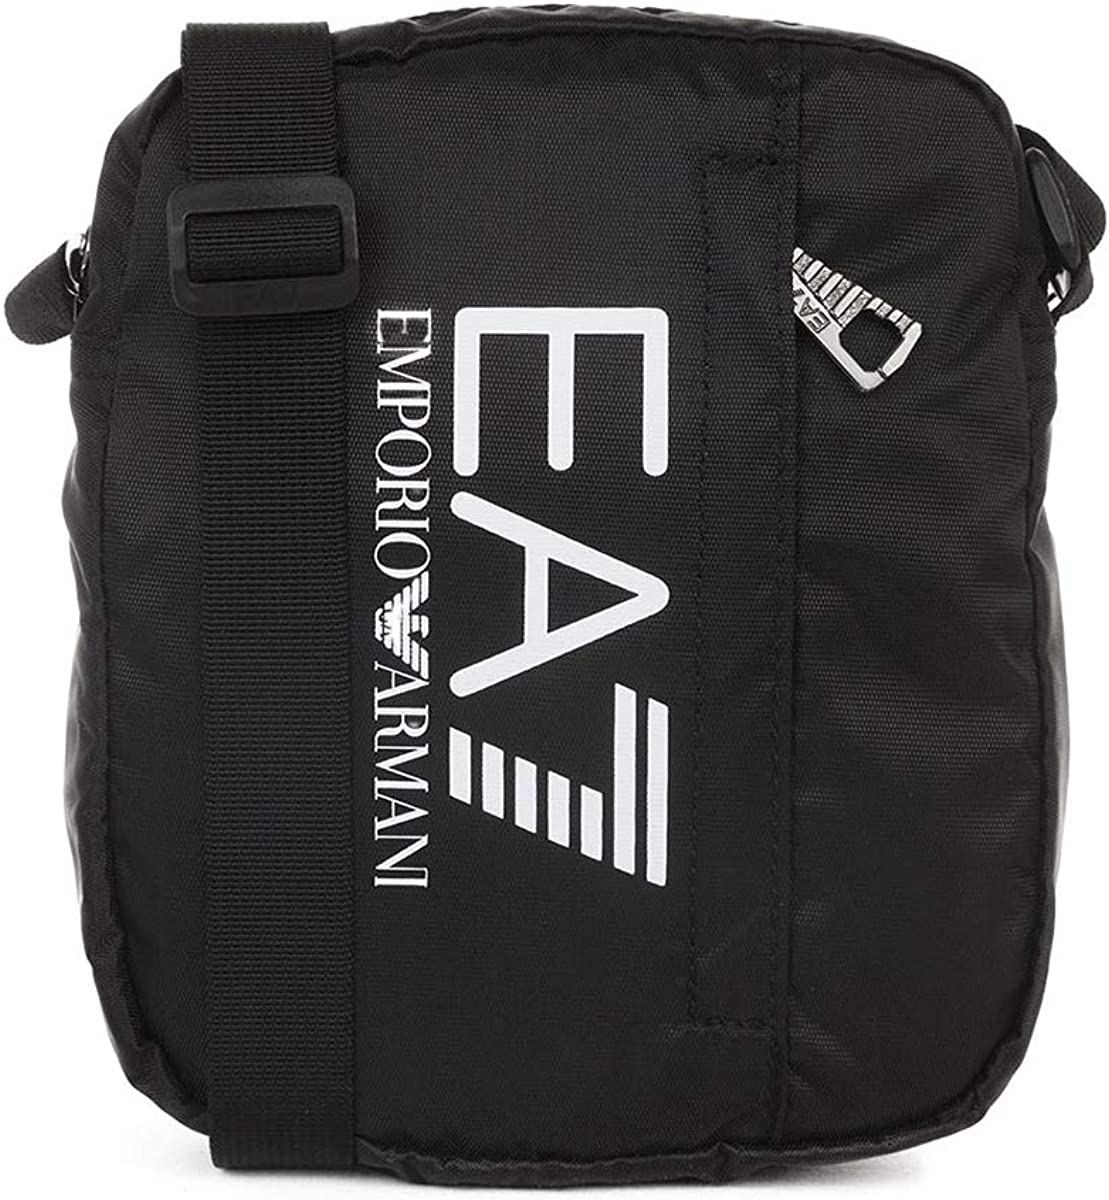 Emporio Armani EA7 TRAIN PRIME U POUCH BAG SMALL C Bolso pequeño/Cartera de mano hombres Gris Bolso pequeño/Cartera